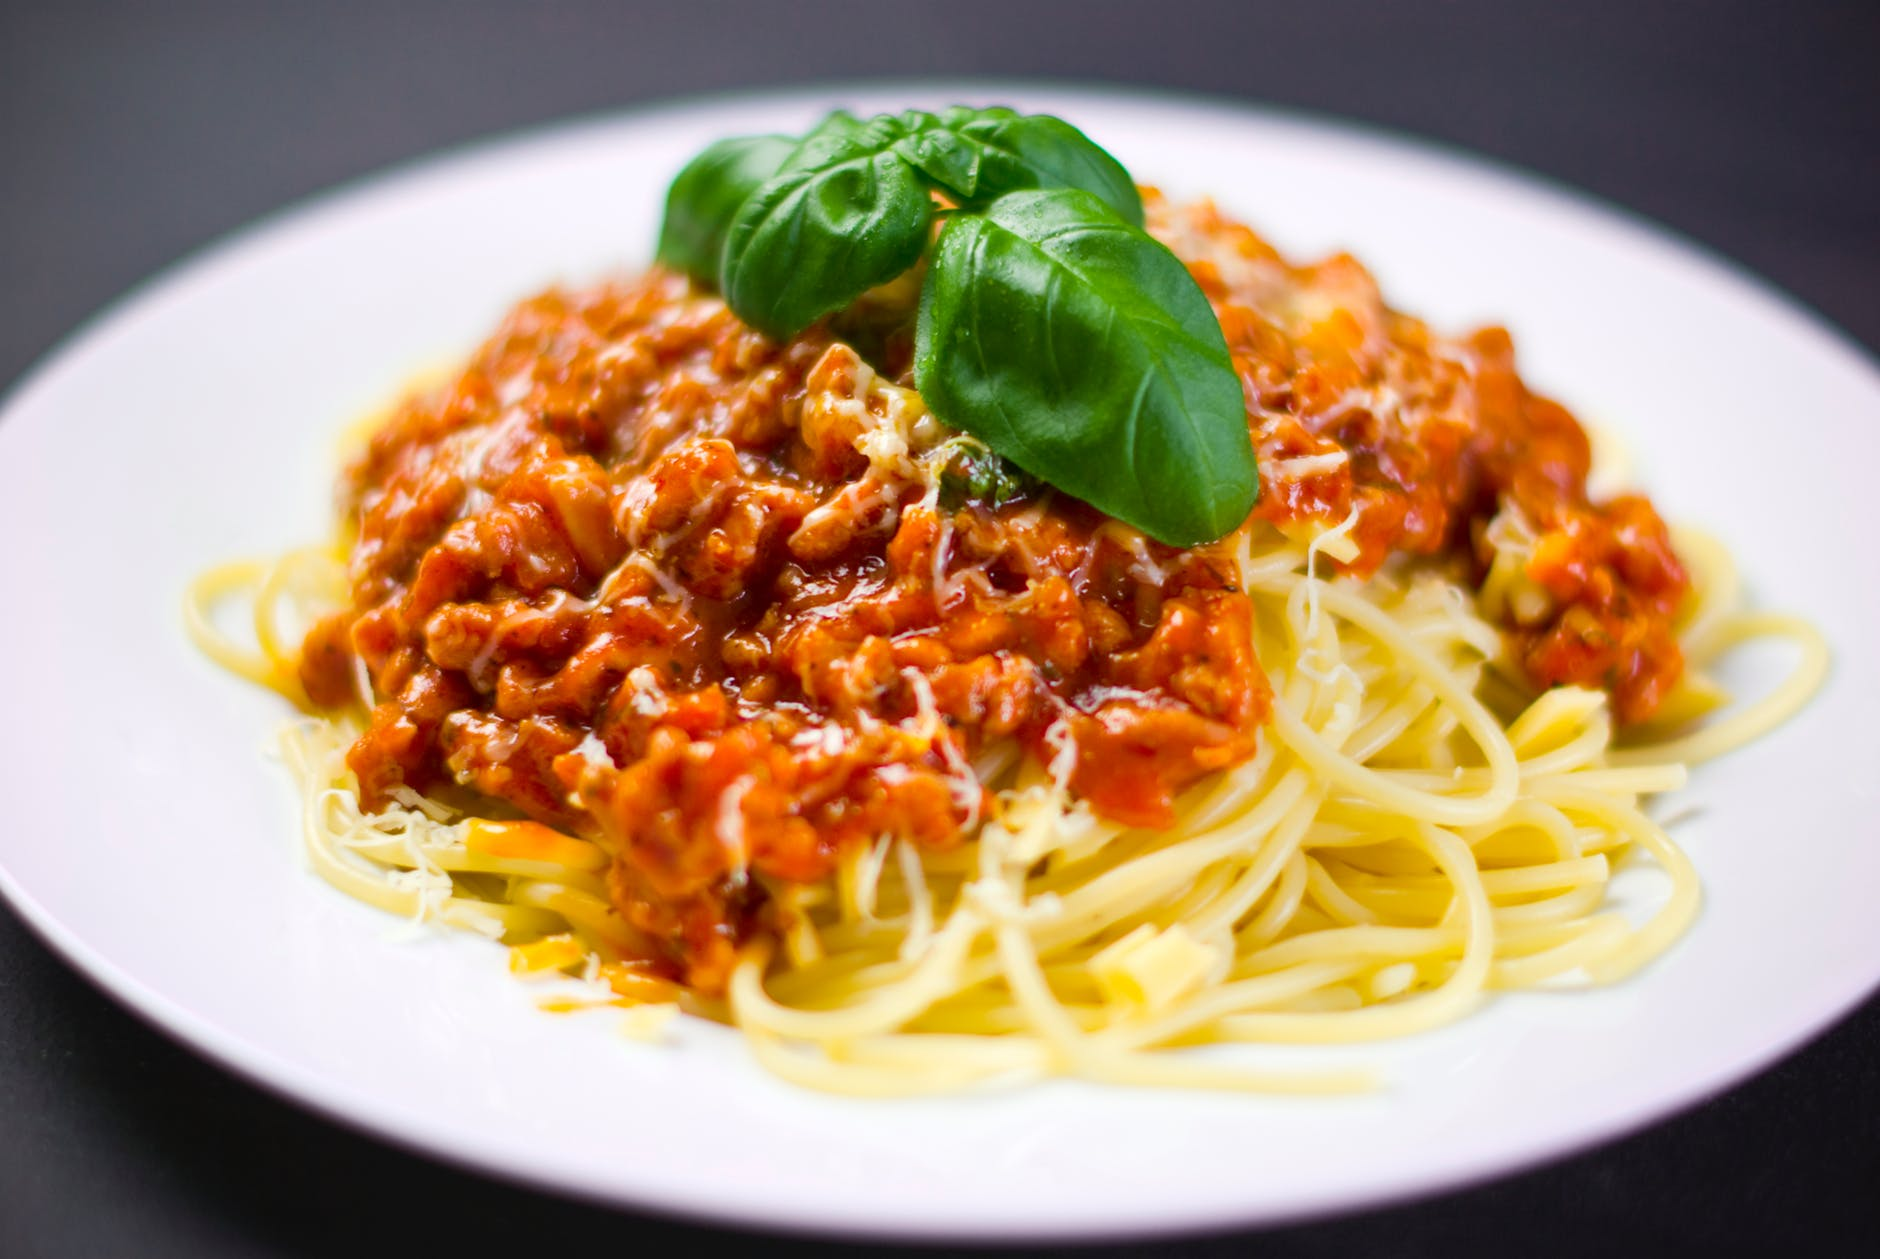 food-dinner-pasta-spaghetti-8500.jpg